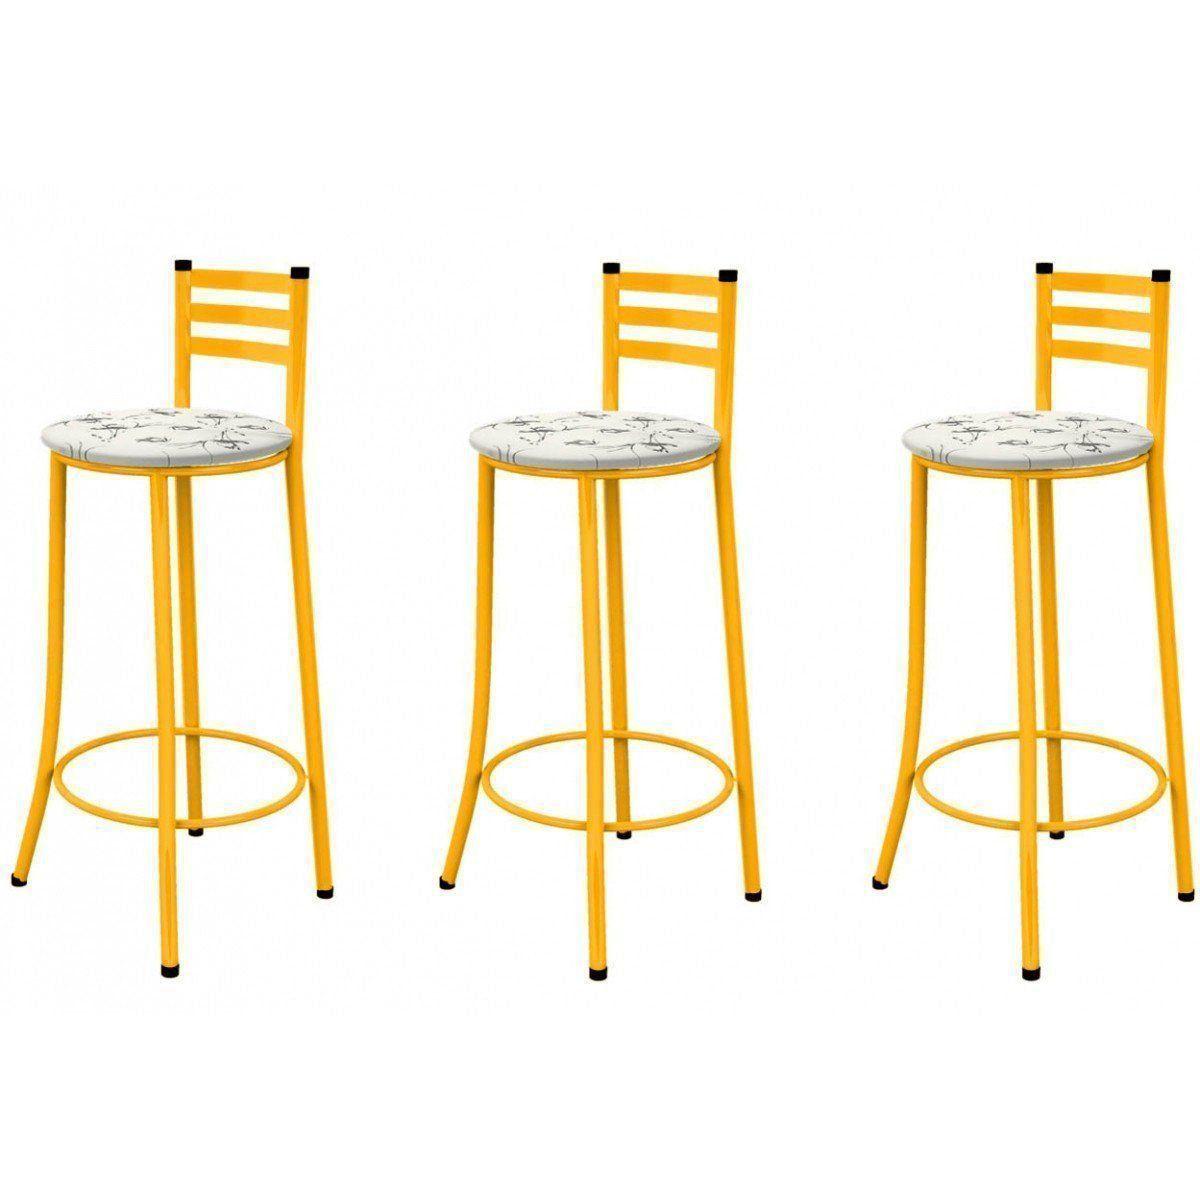 Kit 03 Banquetas Altas com Encosto 86 cm Amarelo - Marcheli